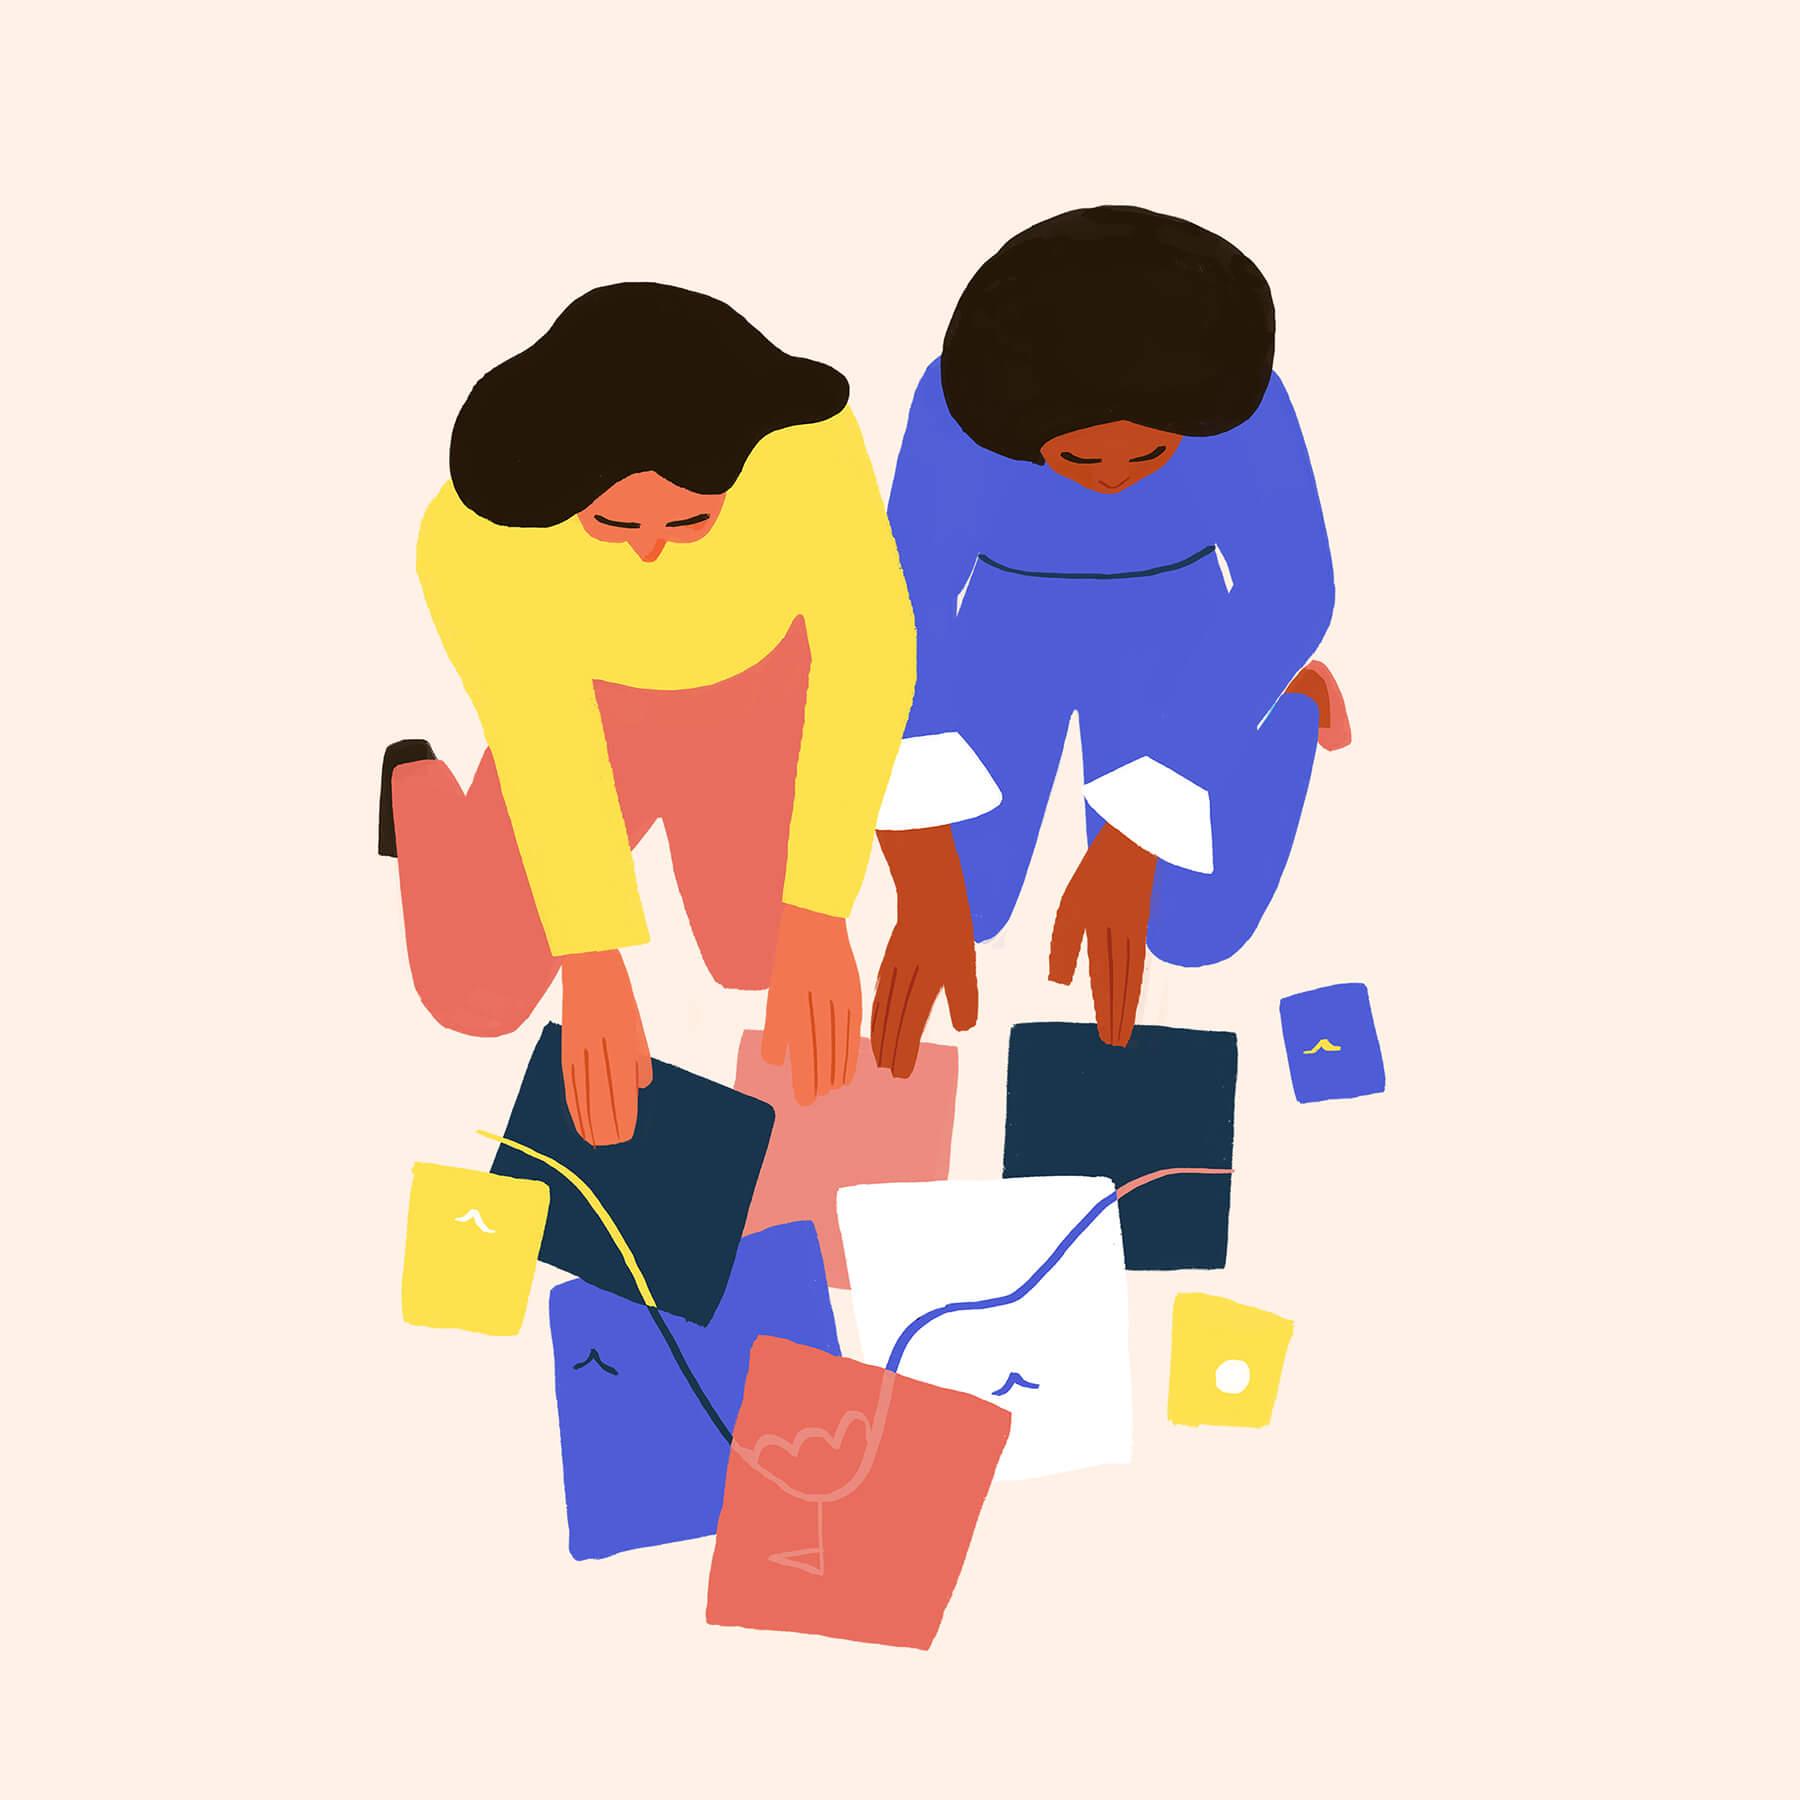 women-building-together-goals-mountain-illustration-violeta-noy